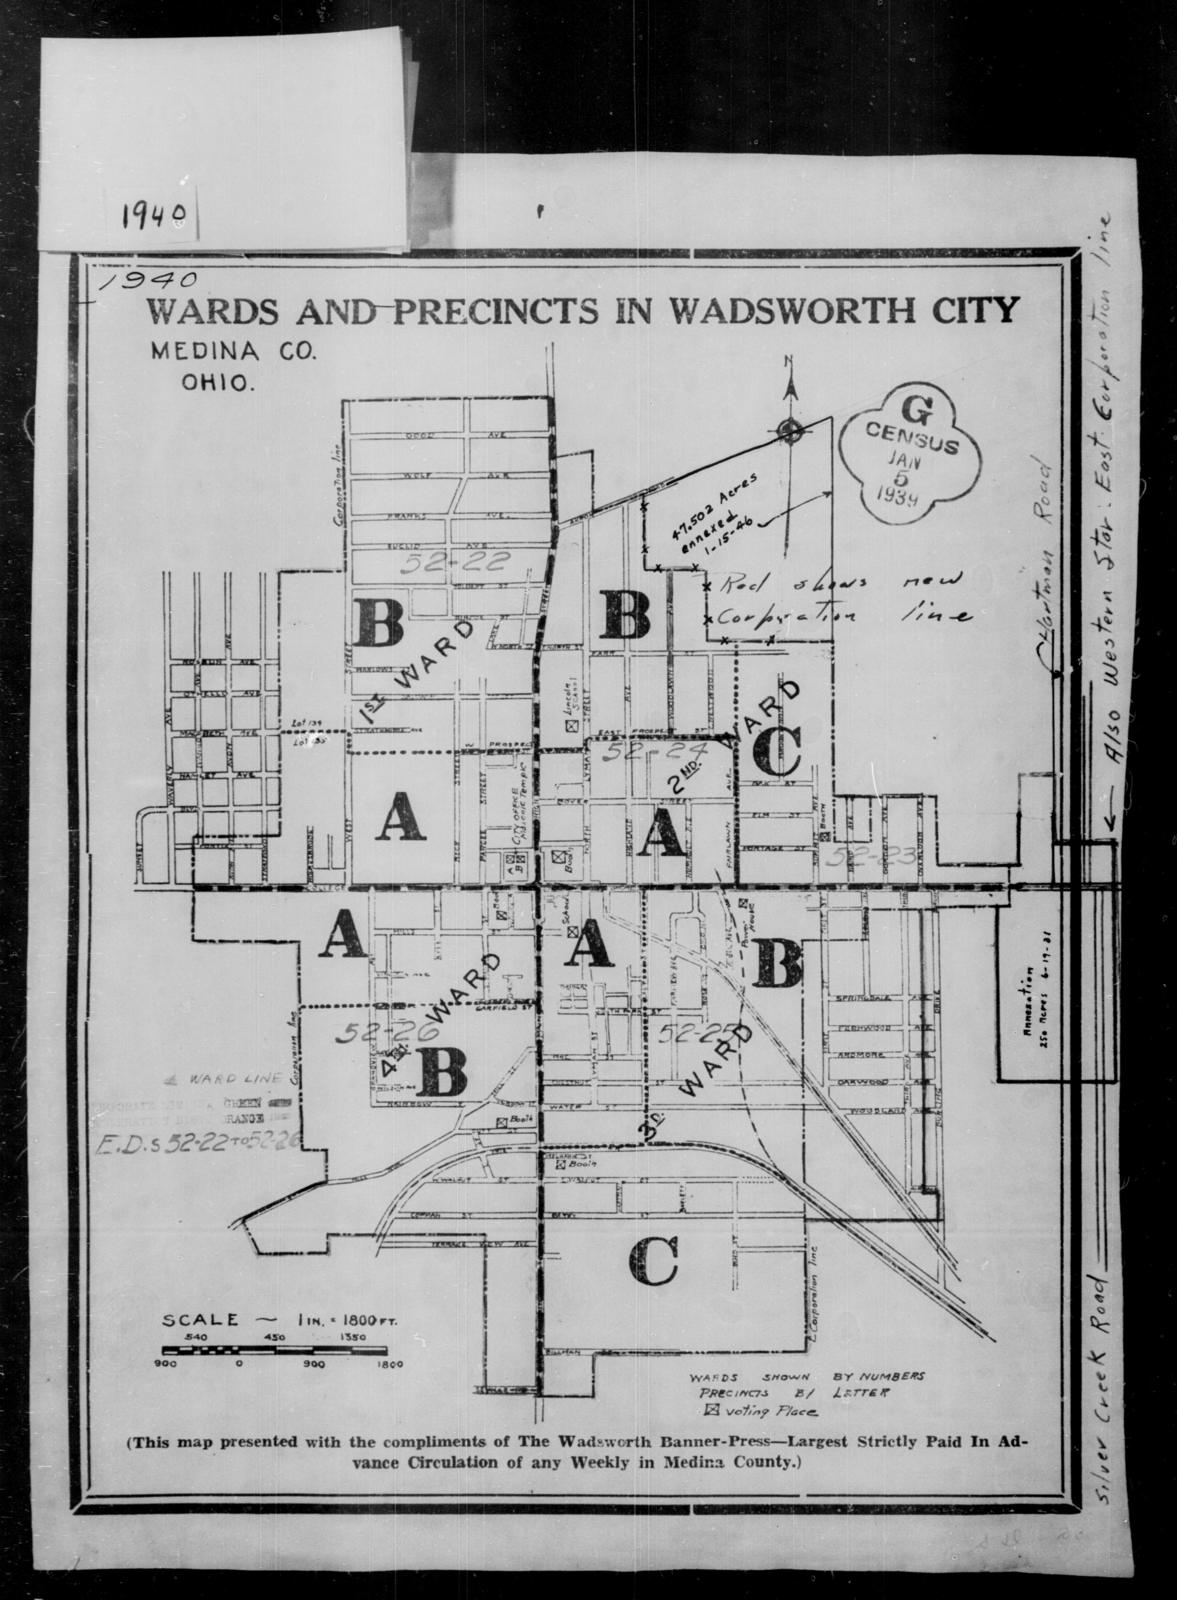 1940 Census Enumeration District Maps - Ohio - Medina County ... on us 33 ohio map, us 30 ohio map, us 23 ohio map, us 35 ohio map,